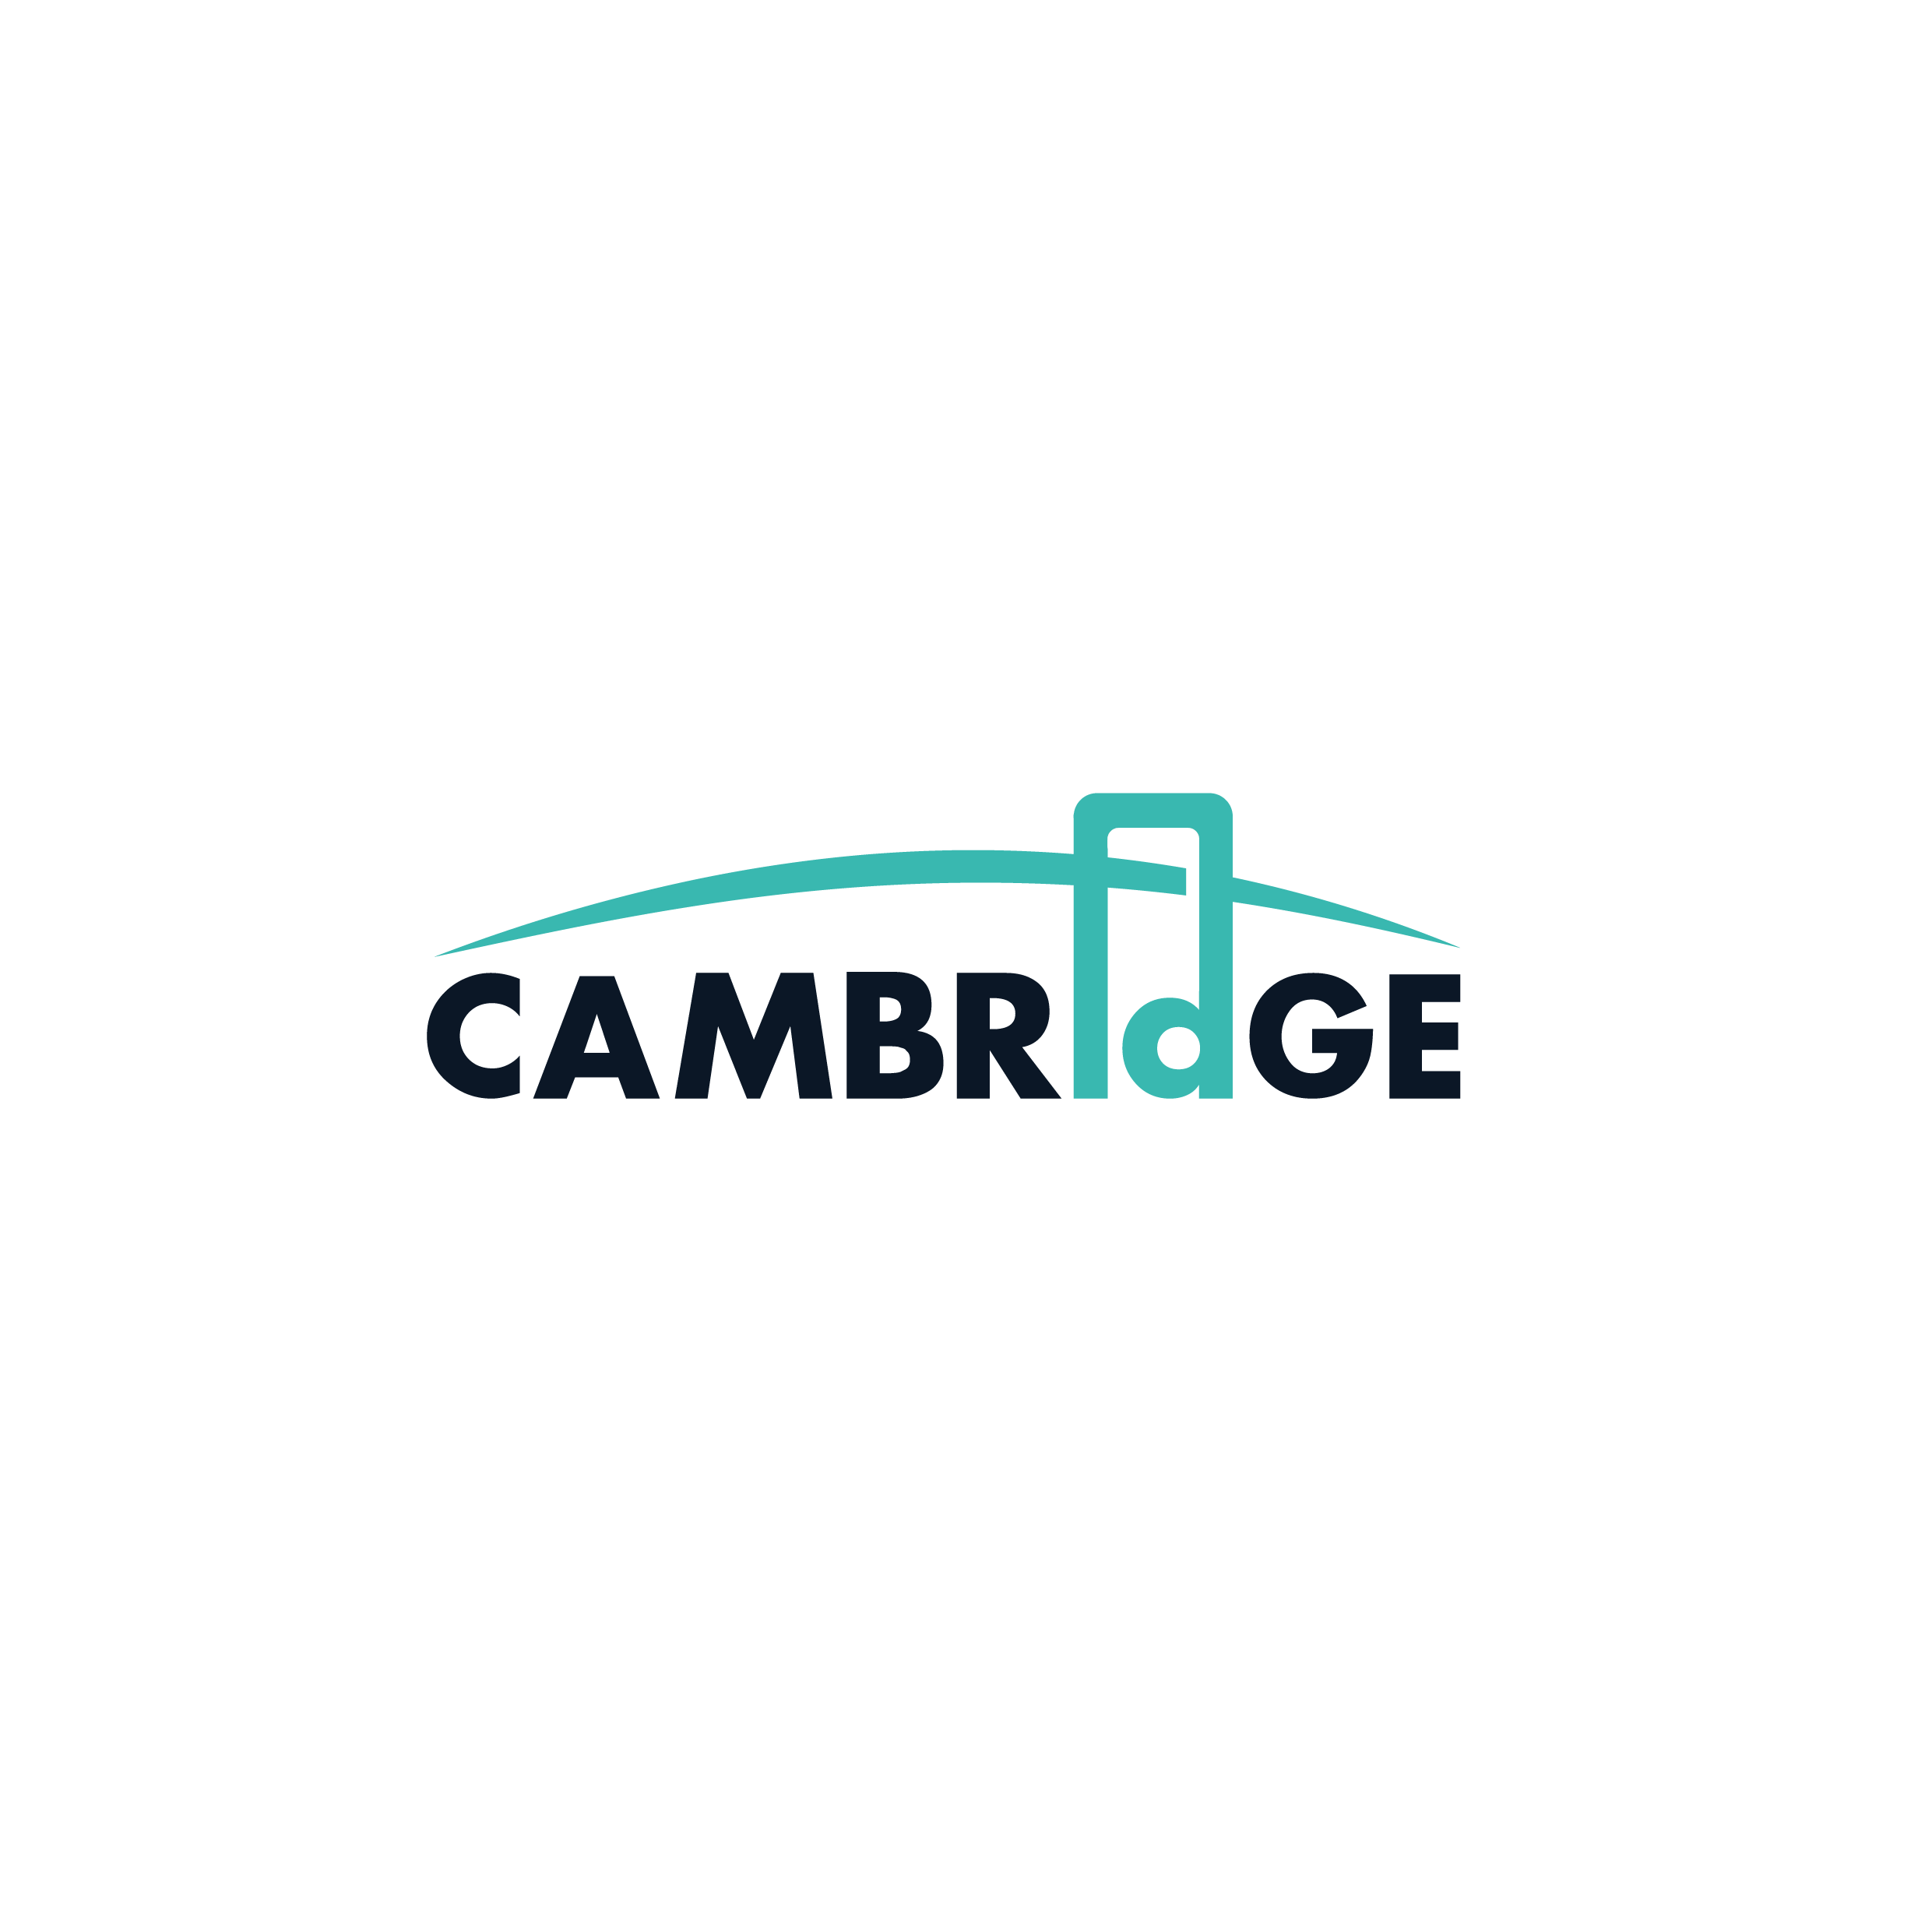 cambridge-02.png